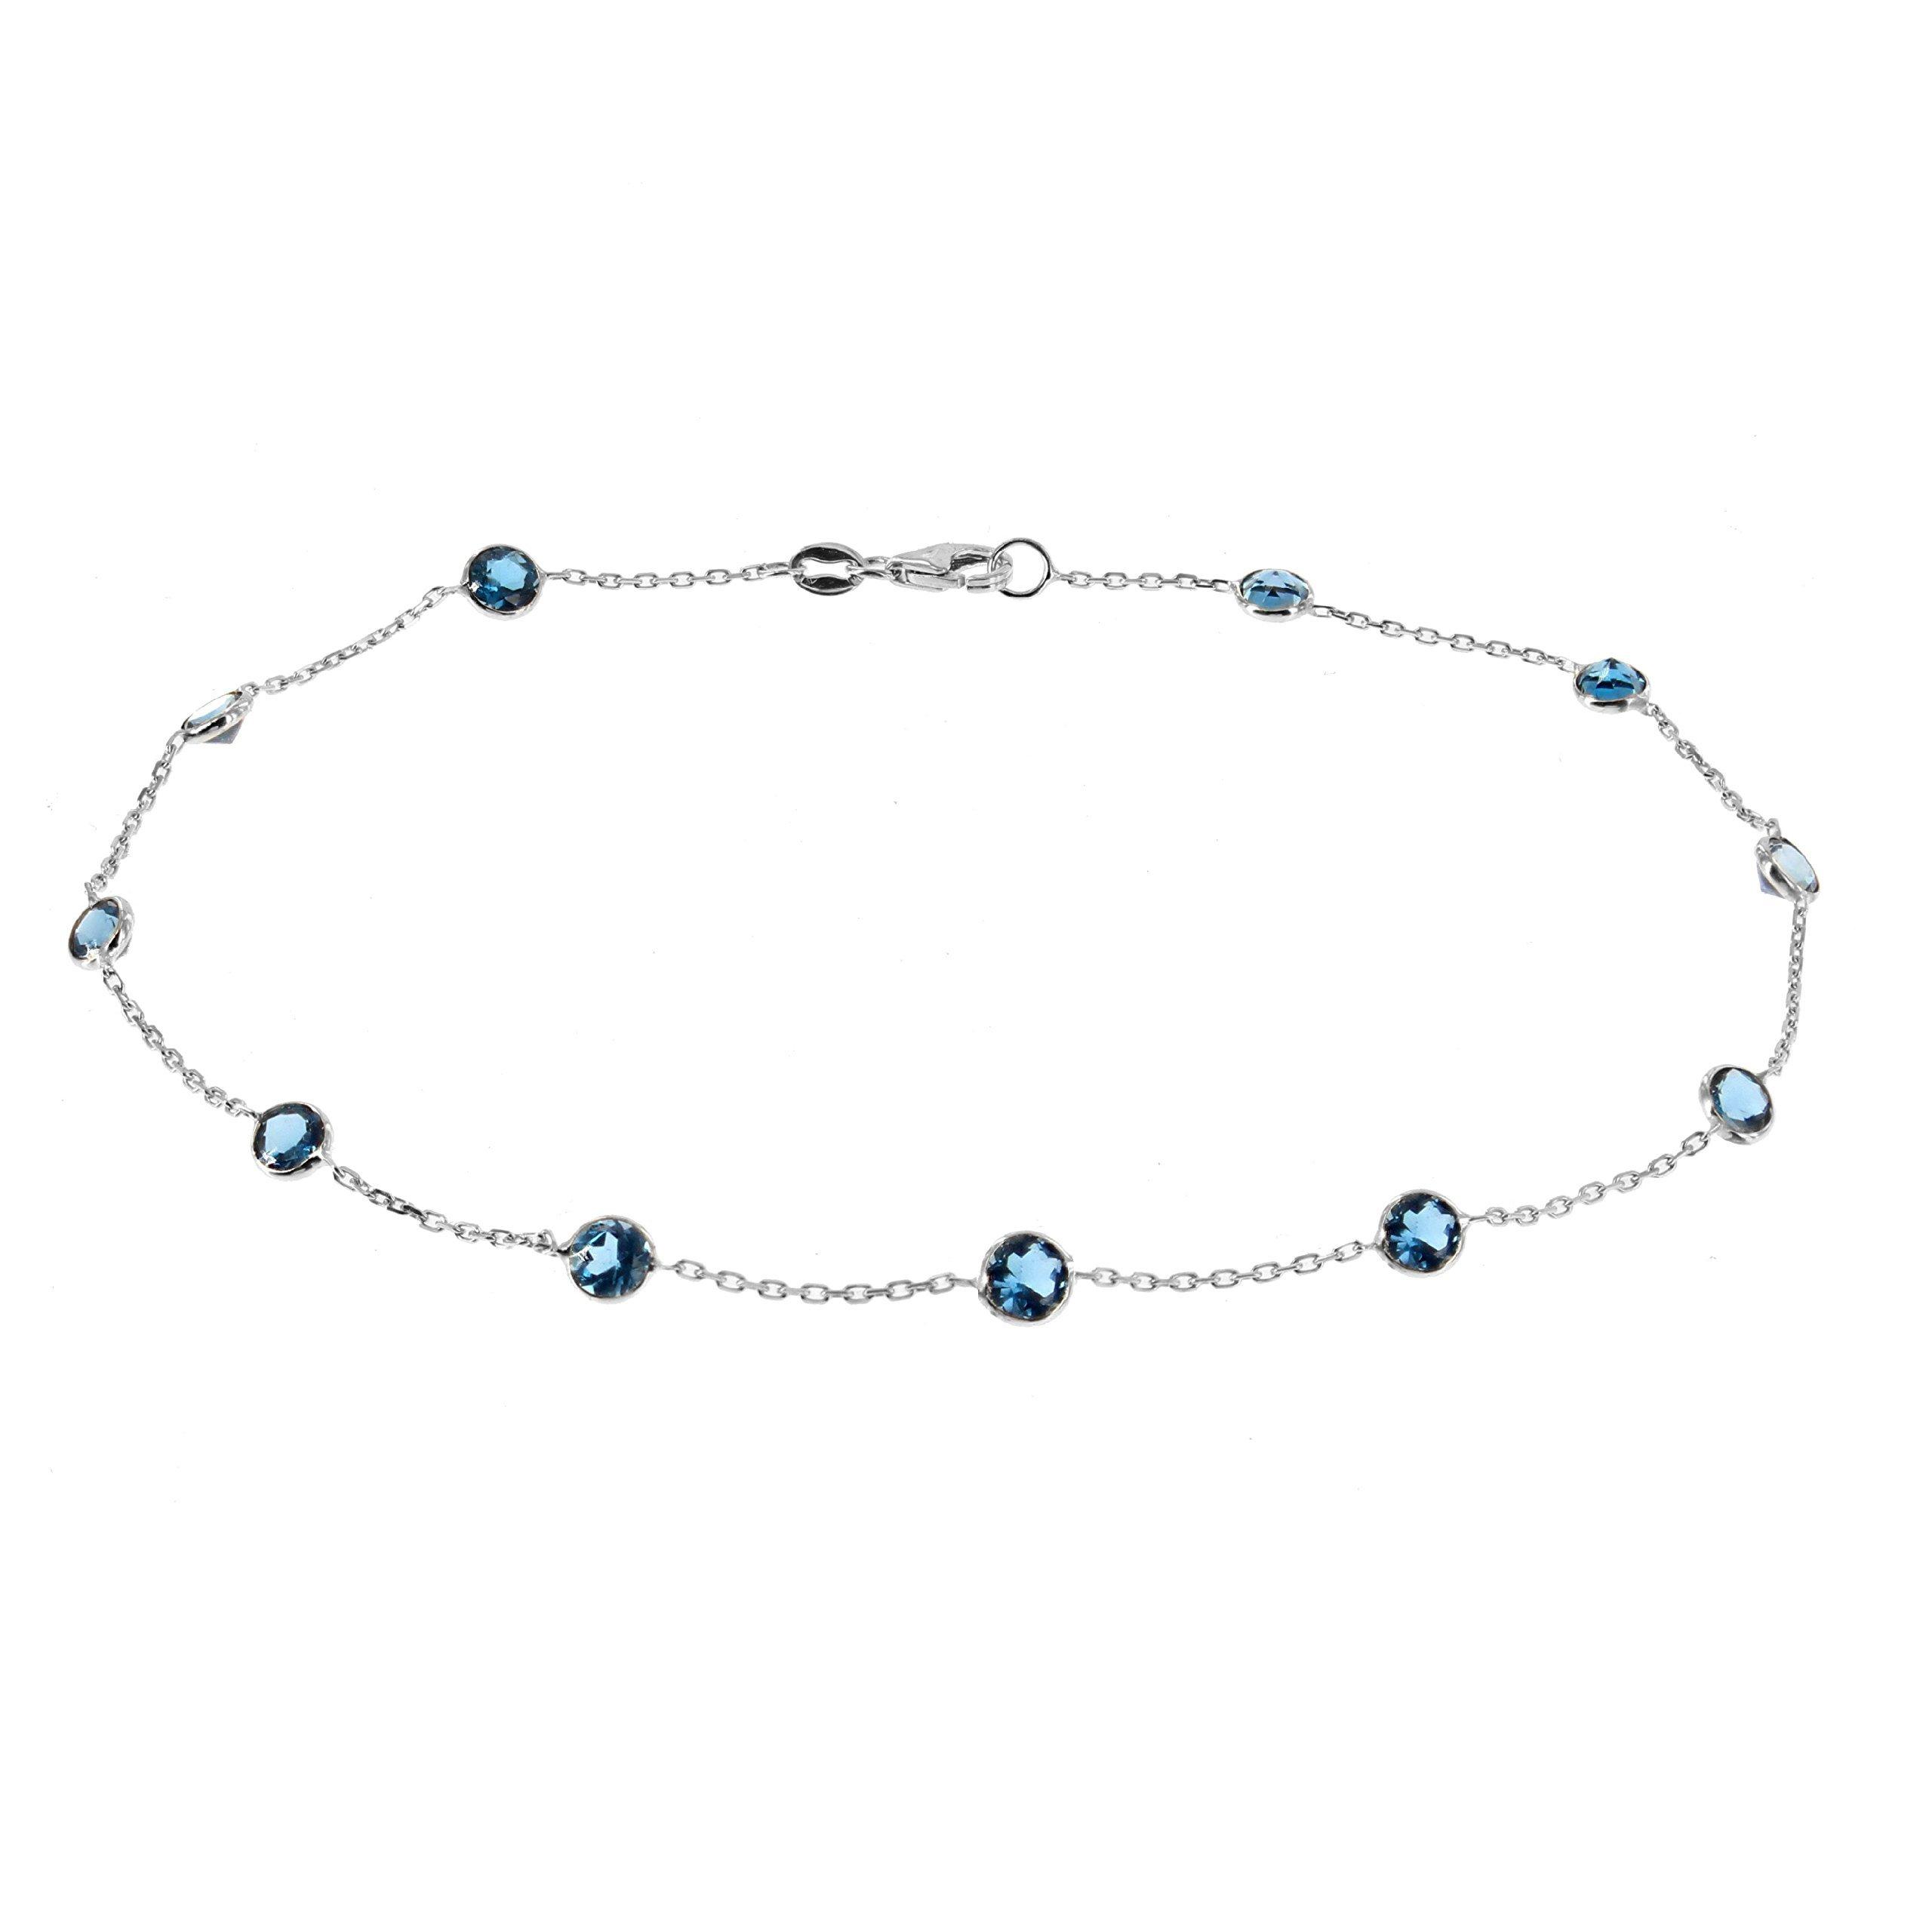 14k White Gold Handmade Station Anklet With London Blue Topaz Gemstones 9 - 11 Inches